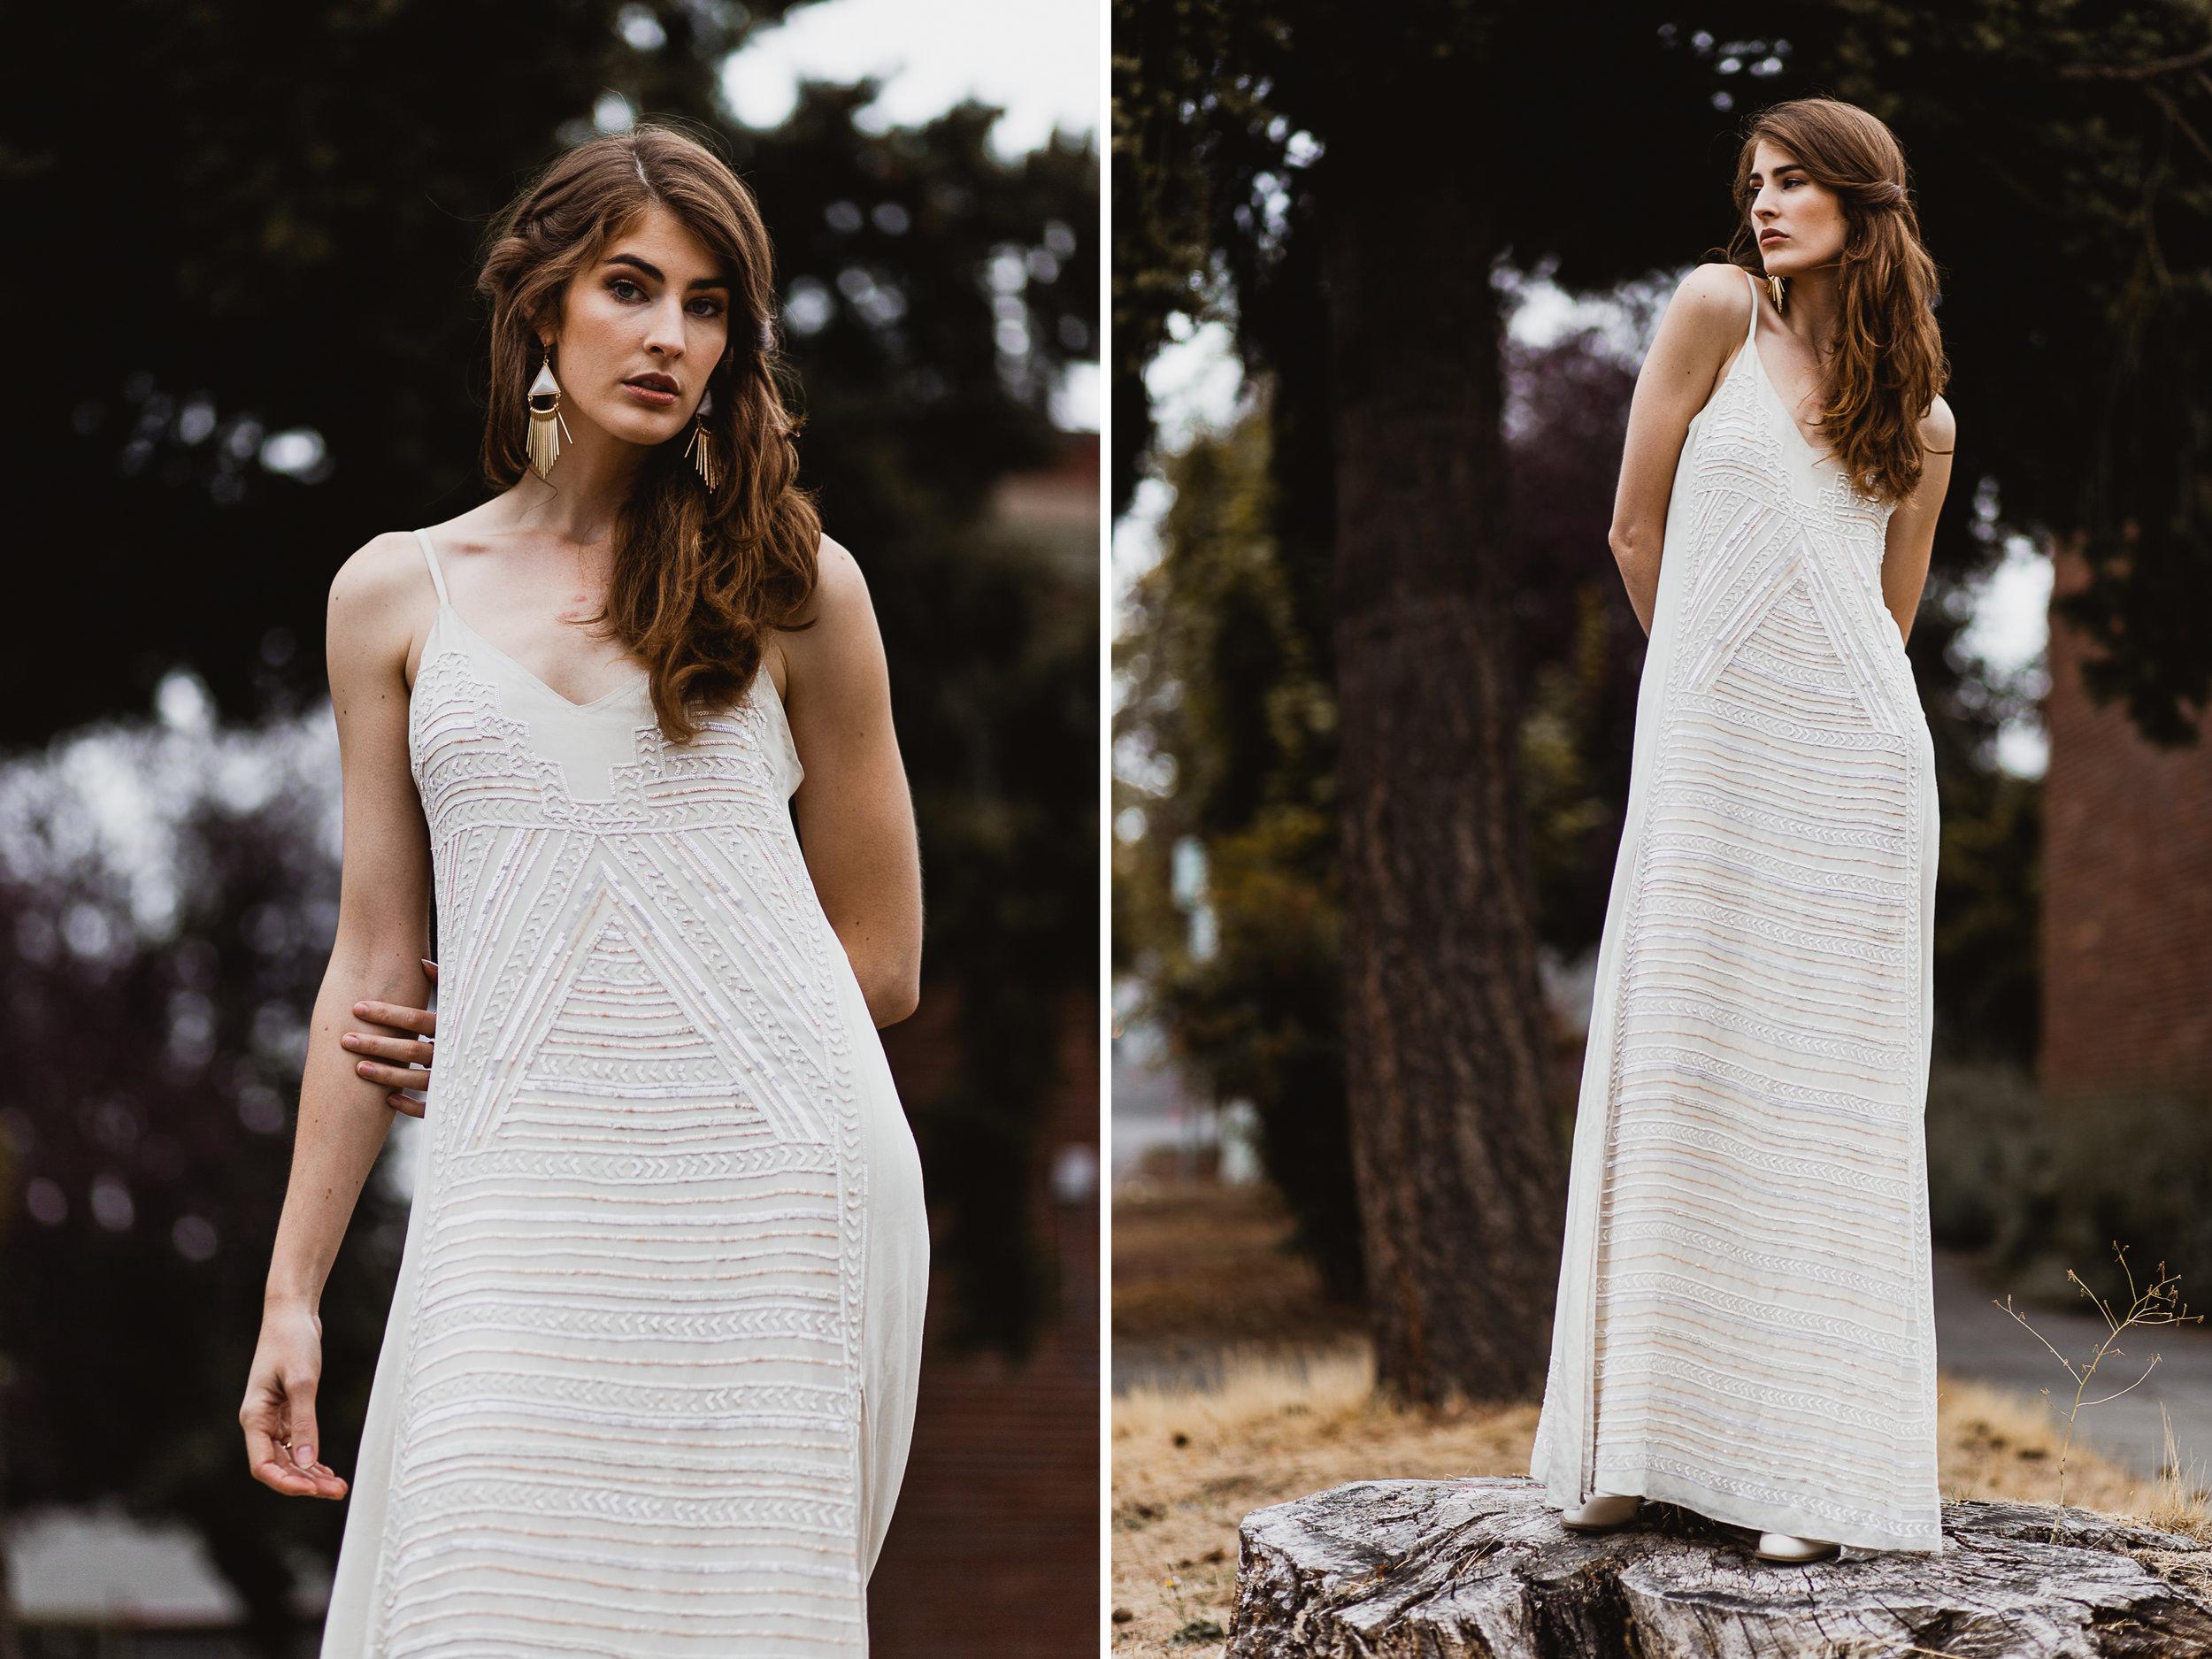 Amy - Bridal Styled Shoot - Vancouver WA - Malina Rose Photography-D91.jpg